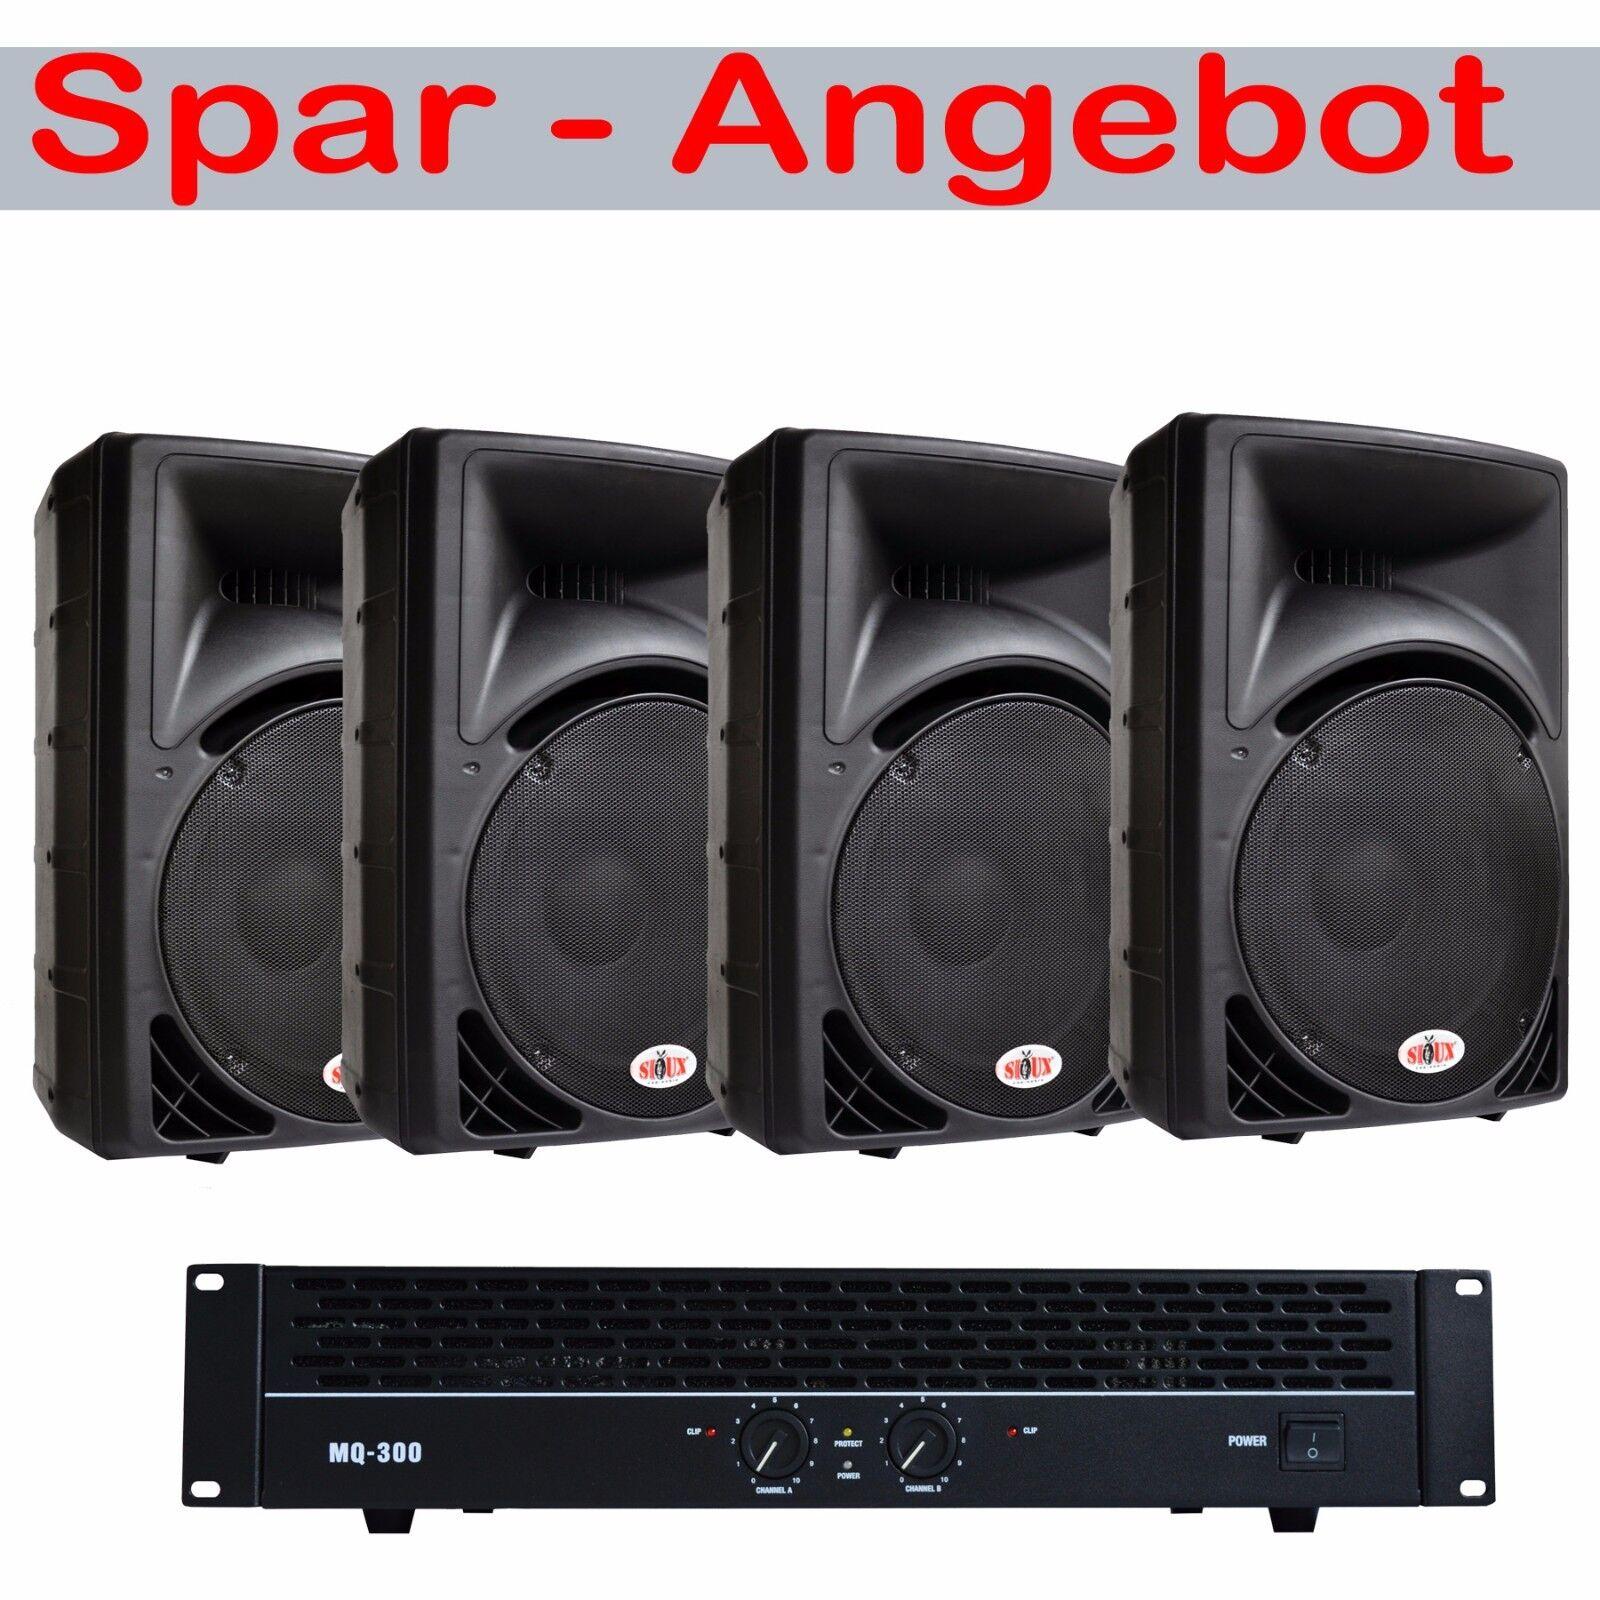 4800 Watt LAUTSPRECHER SET ENDSTUFE + 4 x 1200 WATT PROFI MUSIKER DJ- BOXEN